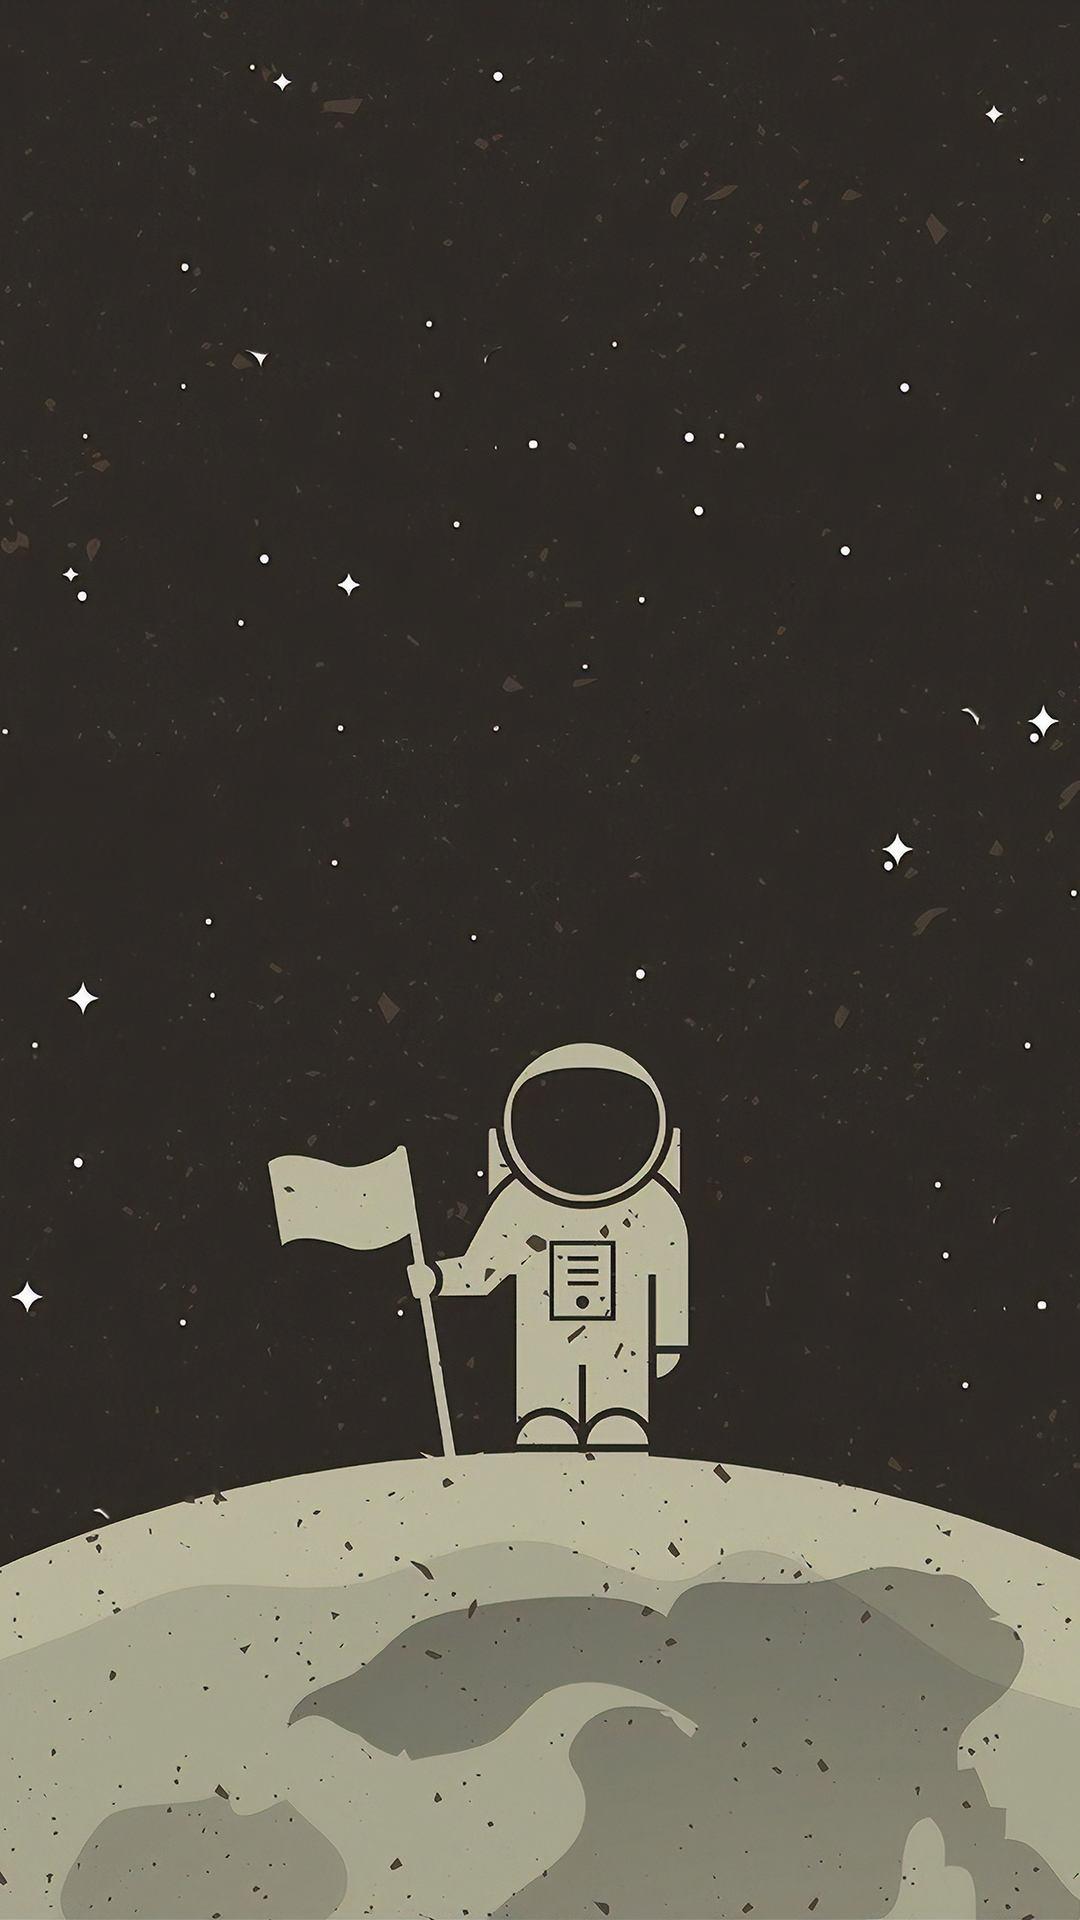 astronaut with flag digital art 4k xn 1080x1920 - Pack de Fondos de Pantalla Minimalistas (+100 Imagenes)